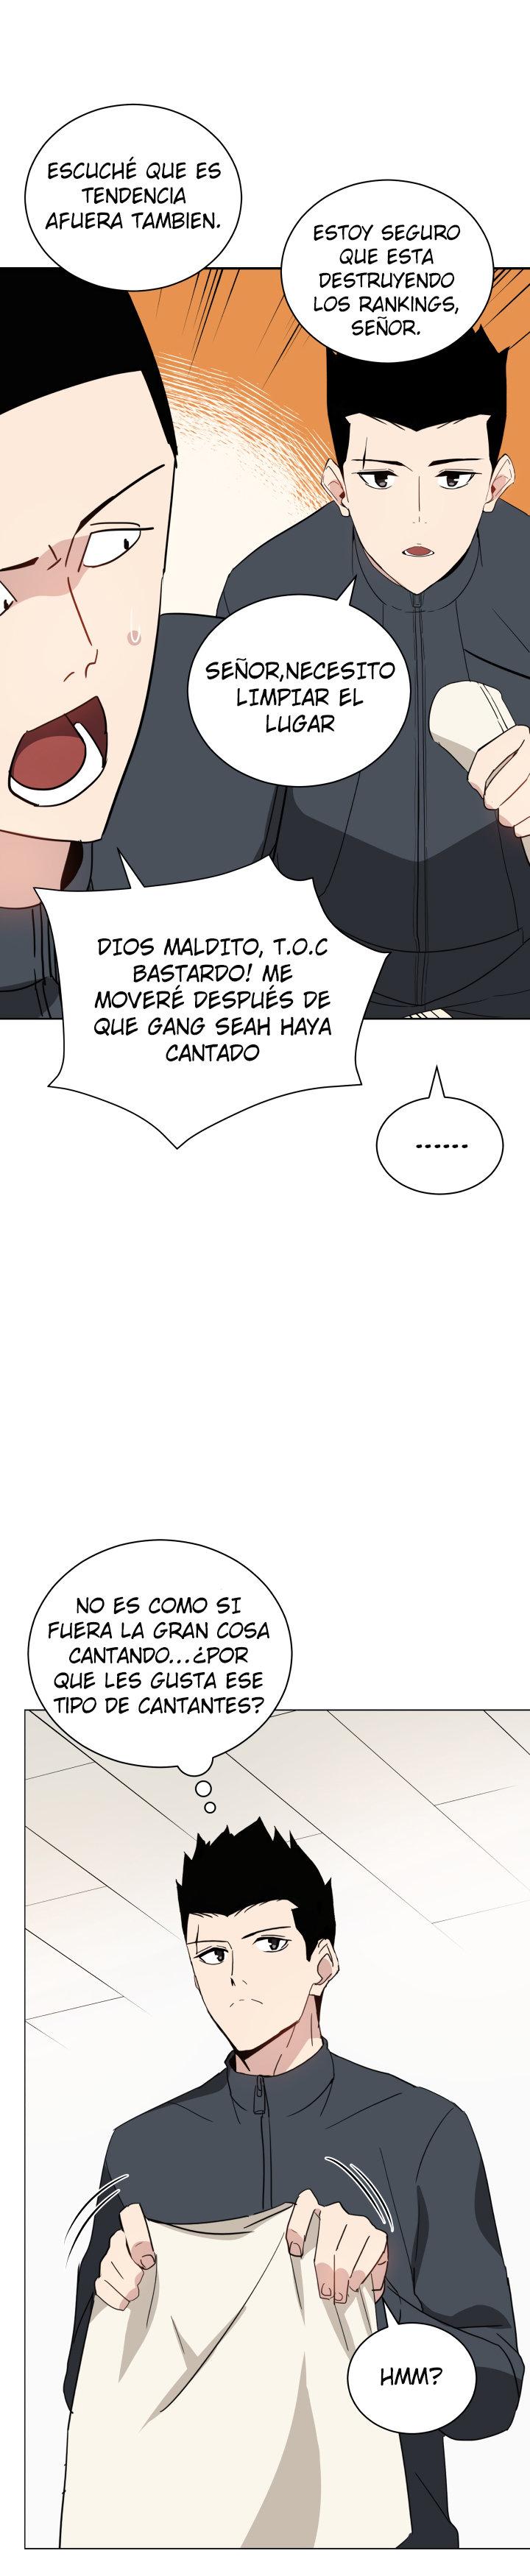 https://nine.mangadogs.com/es_manga/pic8/53/35509/940792/9719ed1080f69f16c8da43ce3166b7fa.jpg Page 15